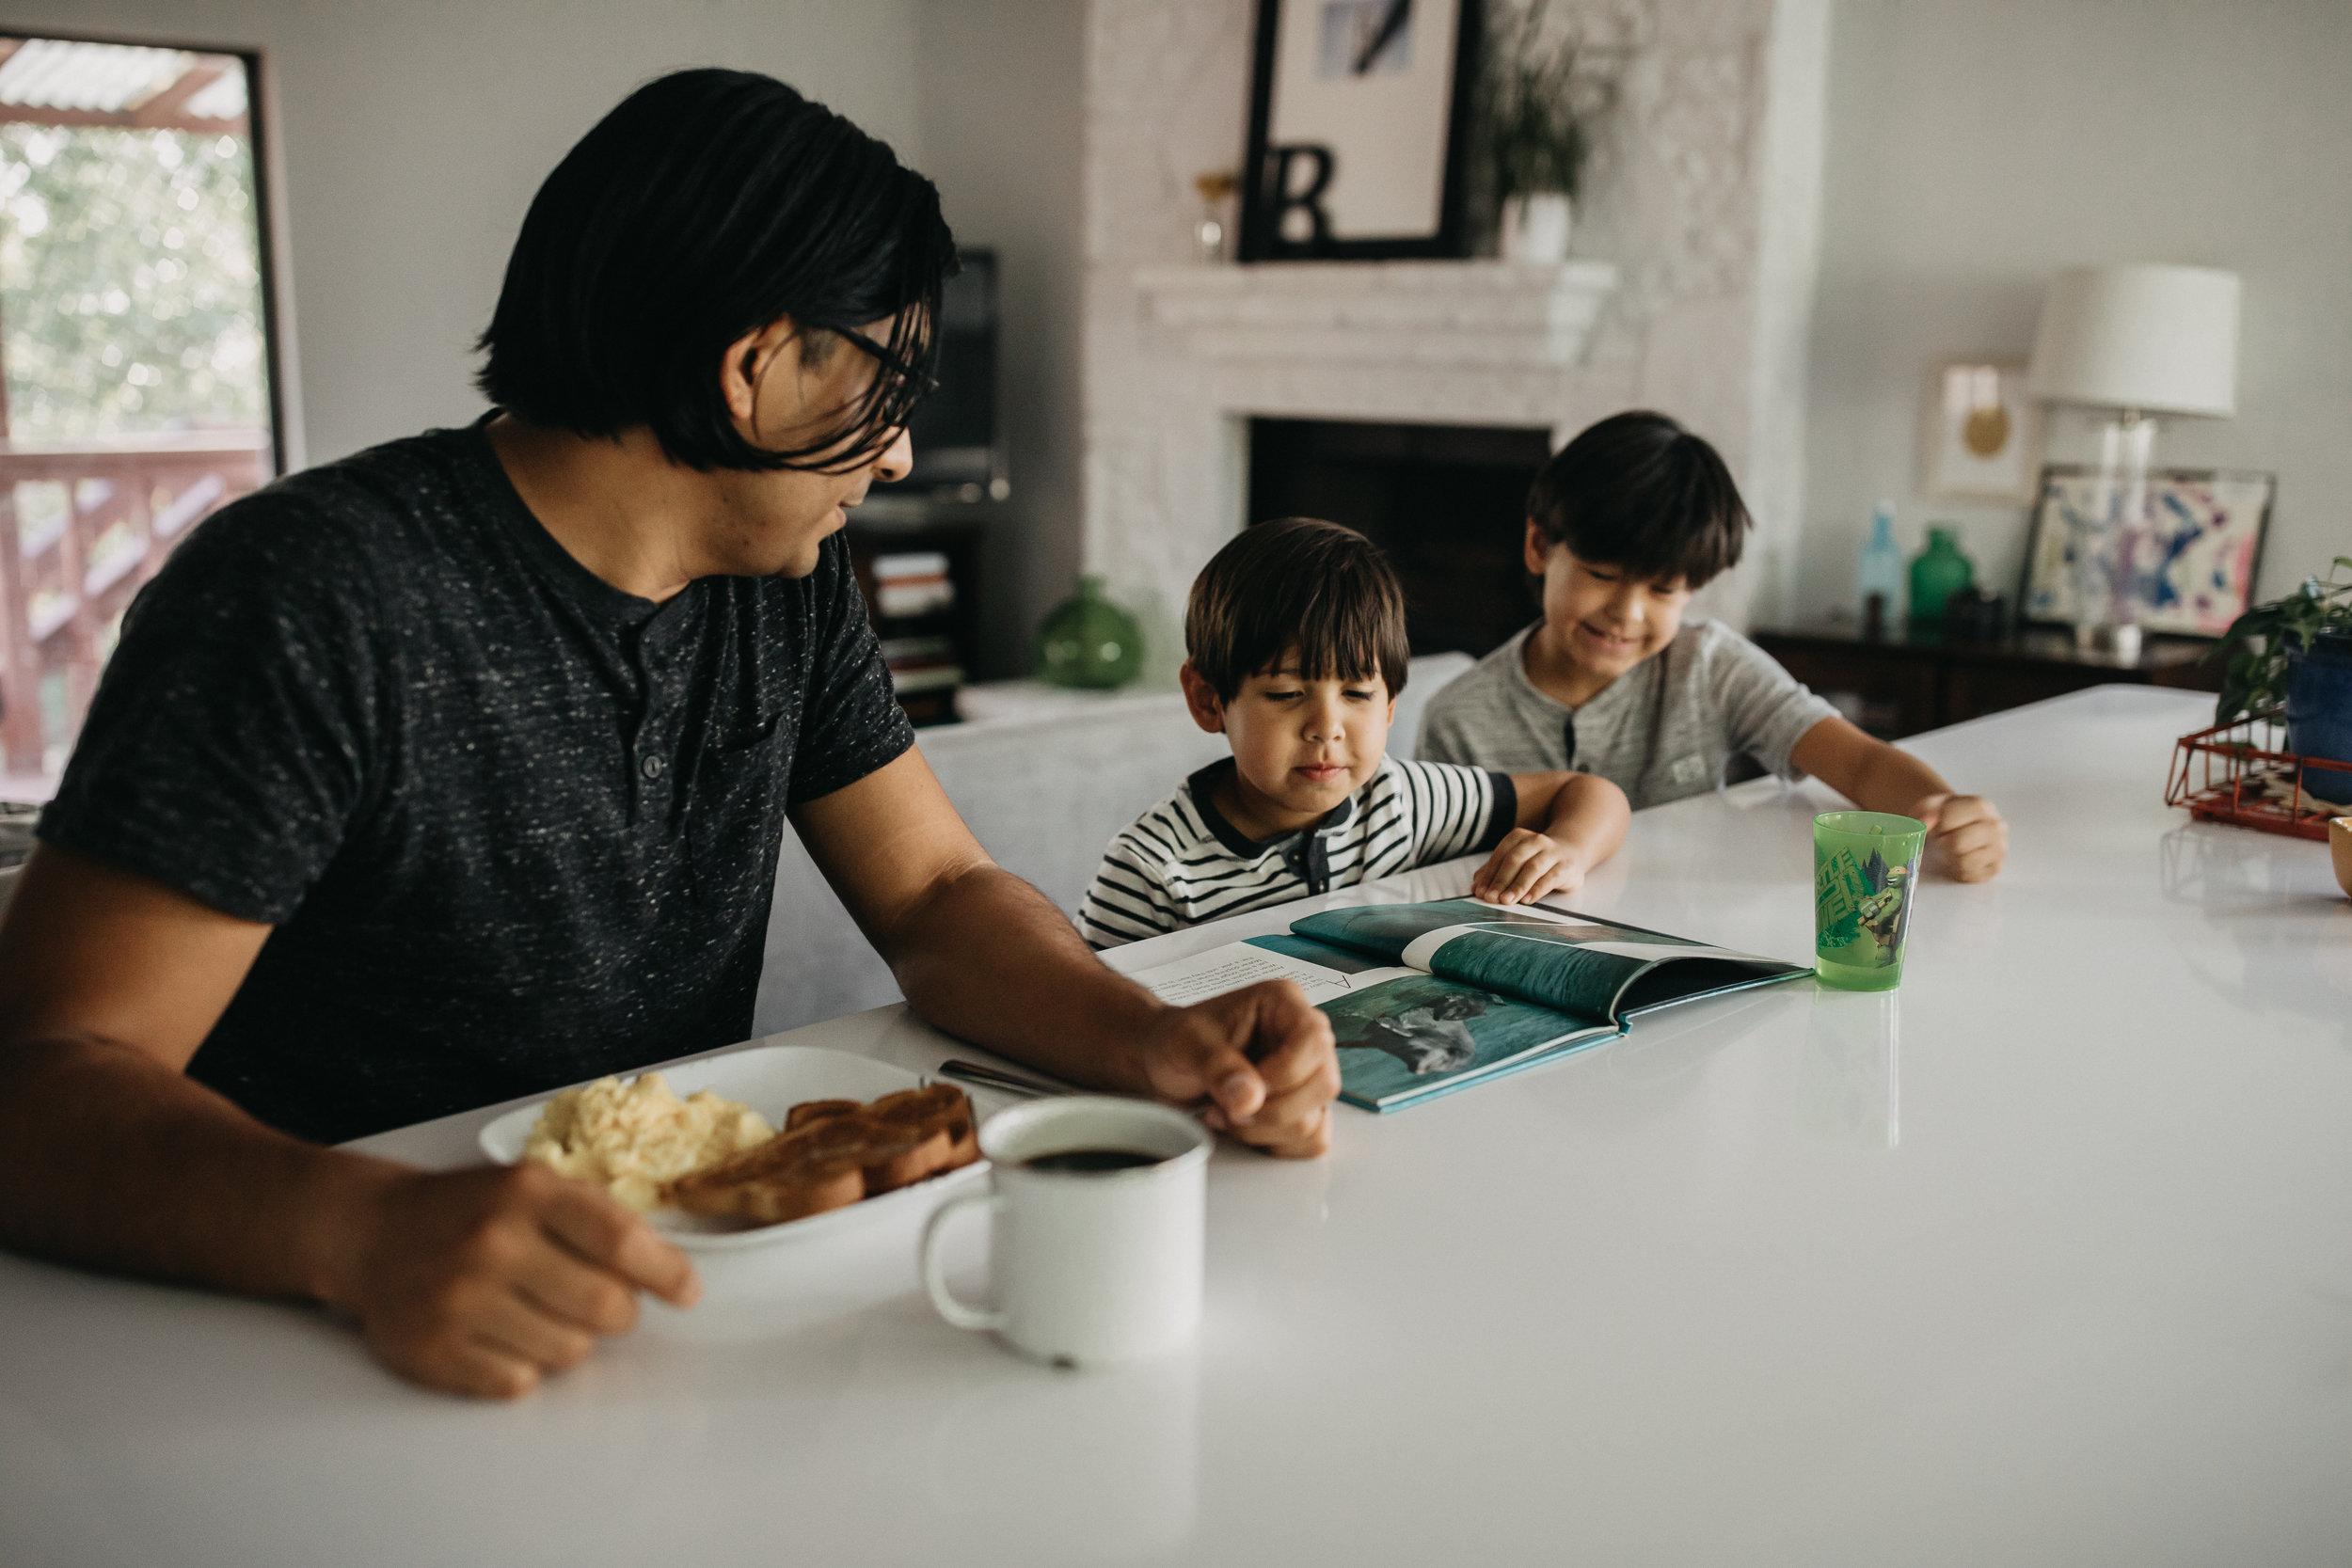 san-antonio-lifestyle-photographer-in-home-session-newborn-session-san-antonio-photographer-cooking-in-kitchen